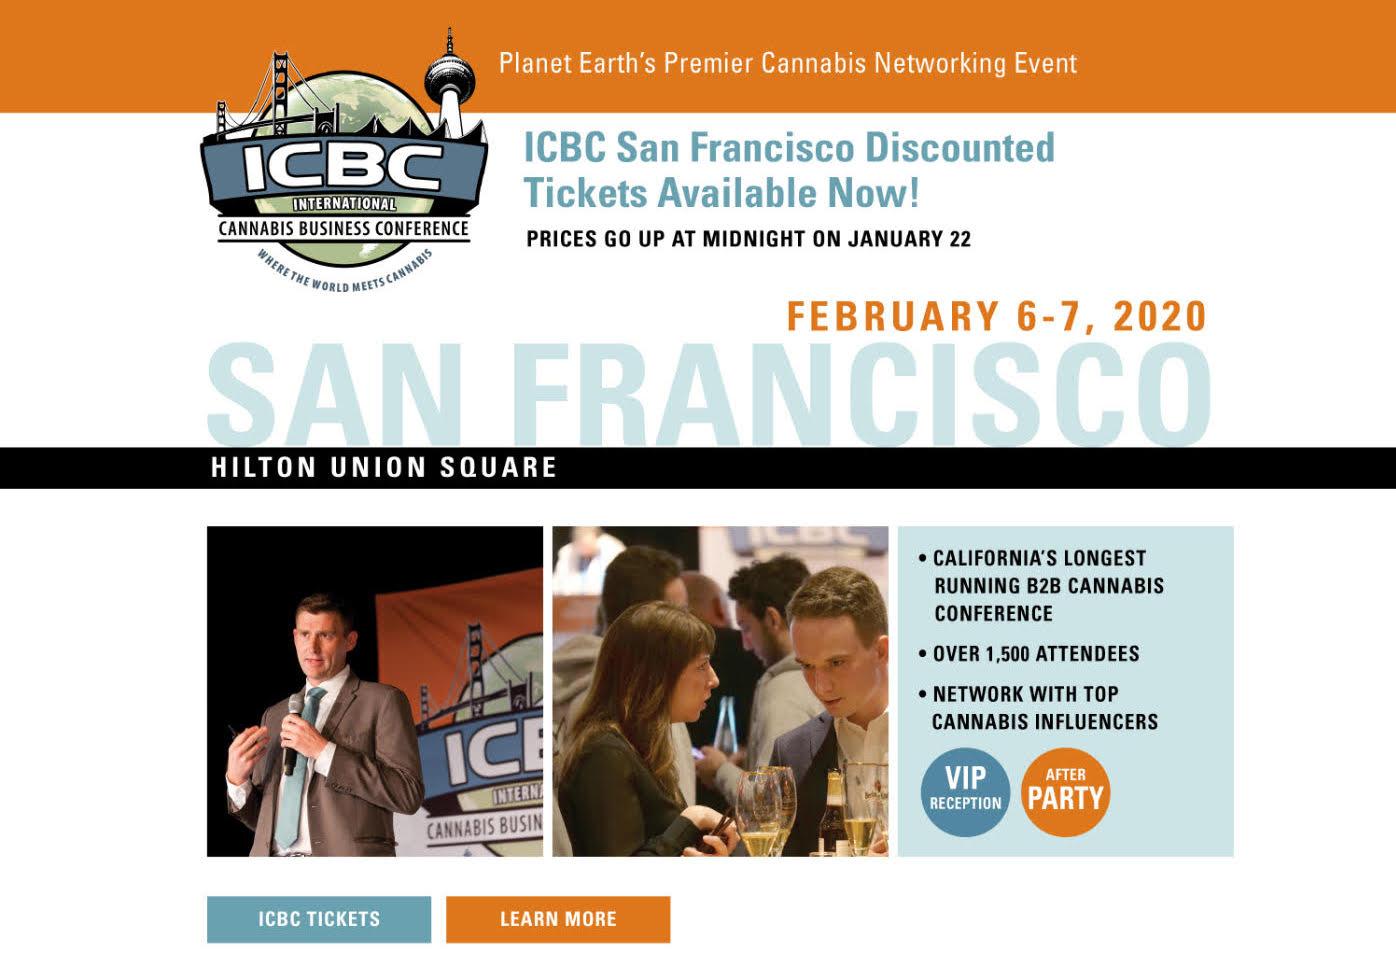 ICBC-San-Francisco-2020-fb-landing-crop2